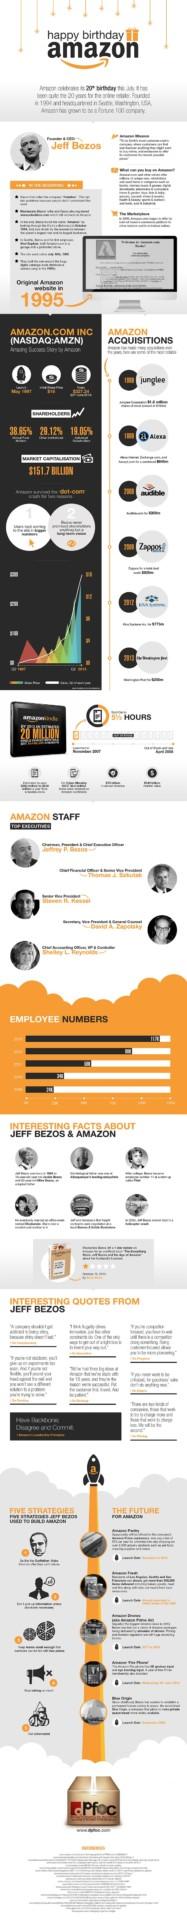 Amazon in numbers Infografik 20 Jahre